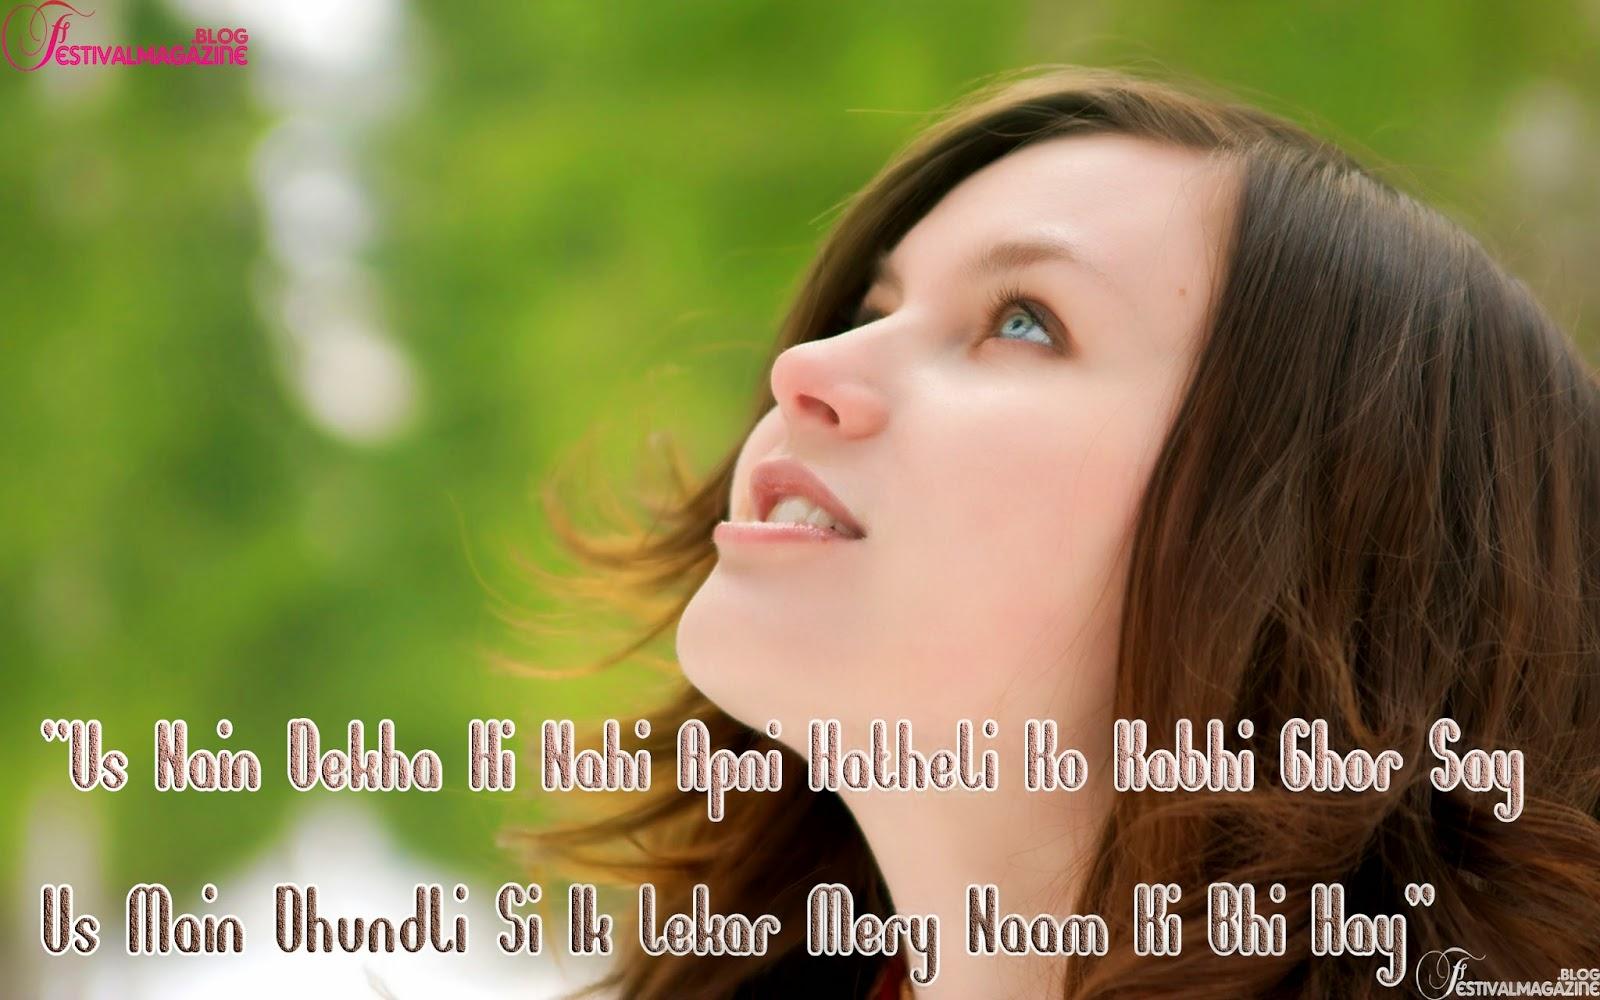 Hindi-Urdu-Romantic-Poetry-Image-With-Girl-Image-HD